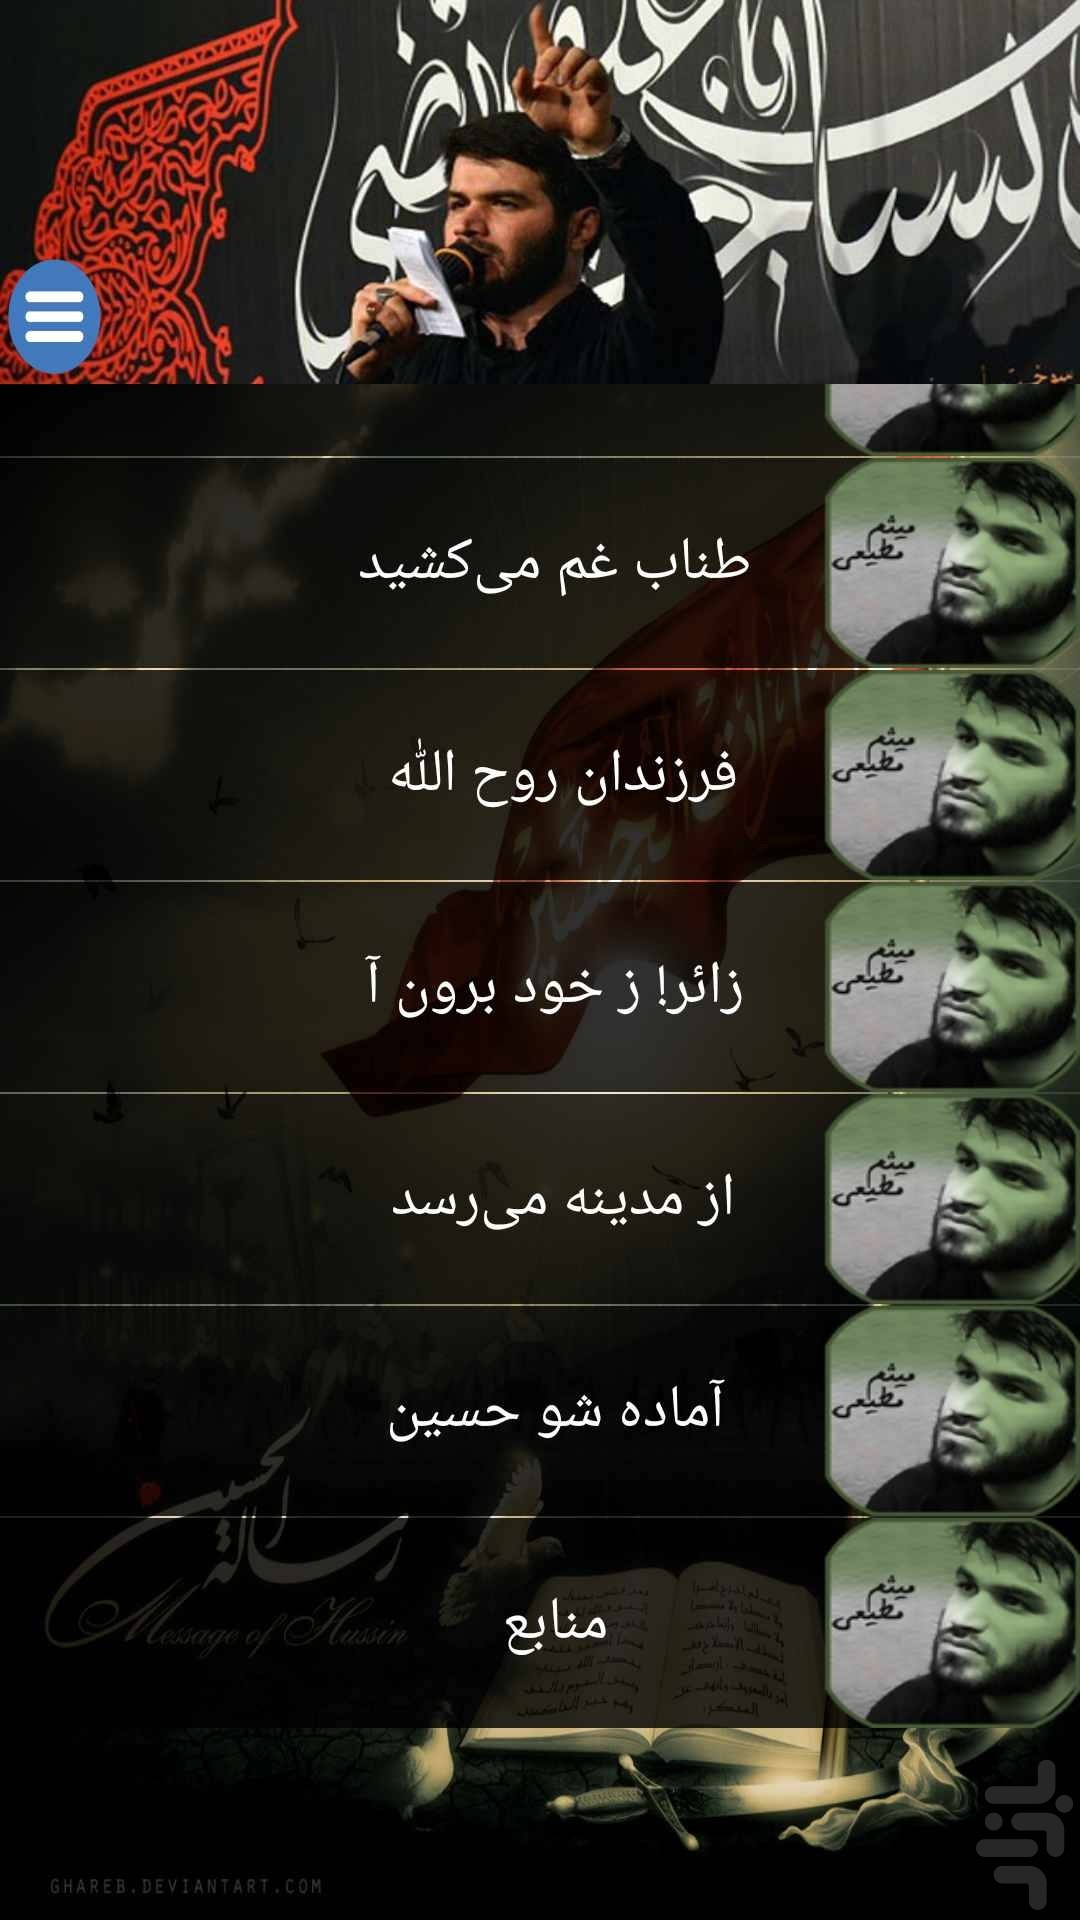 آلبوم مداحی حاج میثم مطیعی